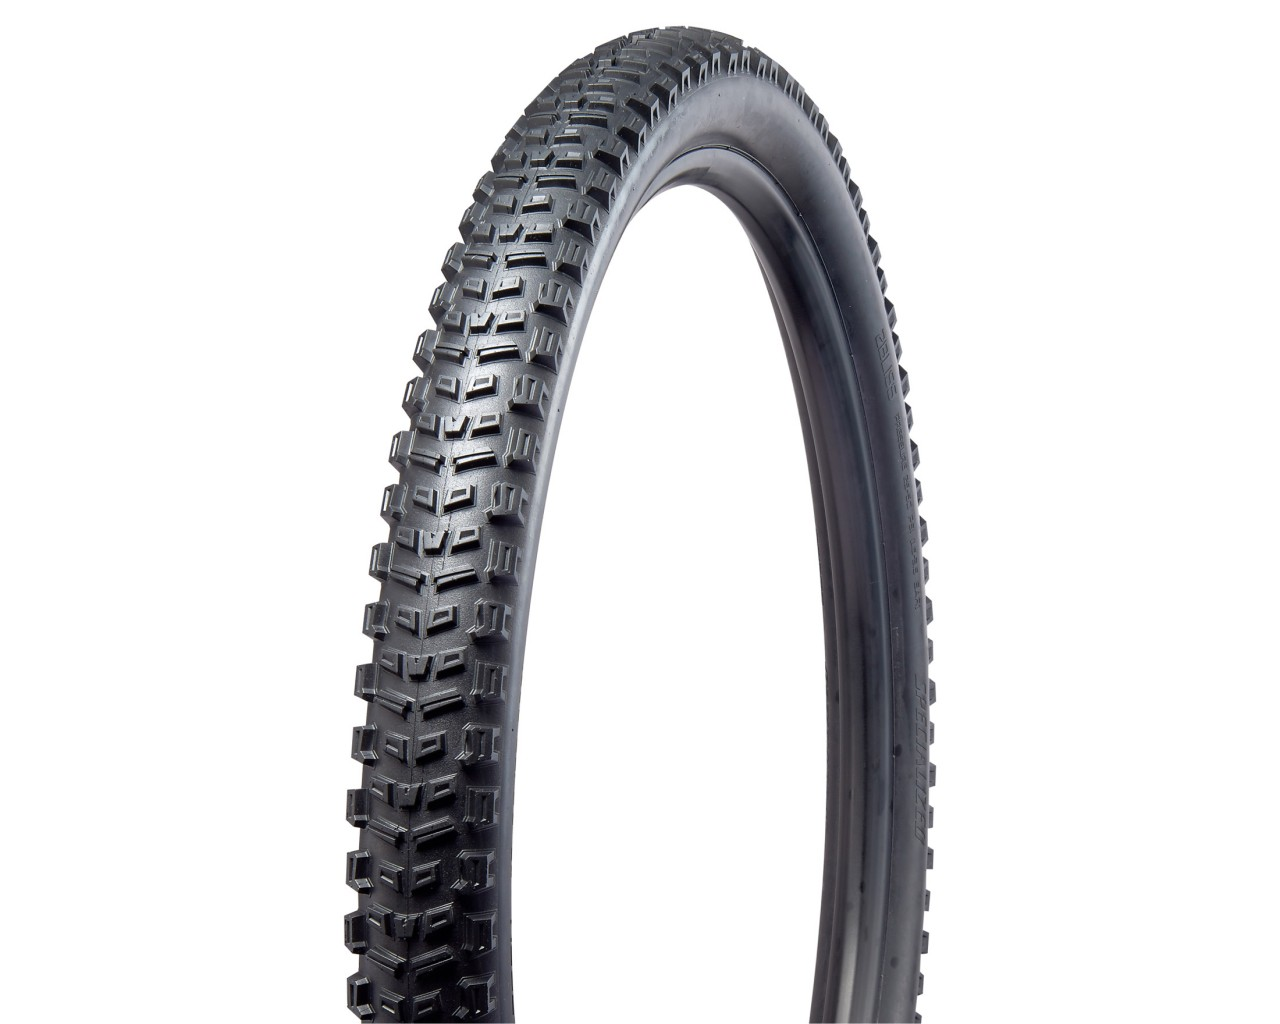 Specialized Purgatory Grid 2bliss MTB tire 27.5 x 2.3 | black